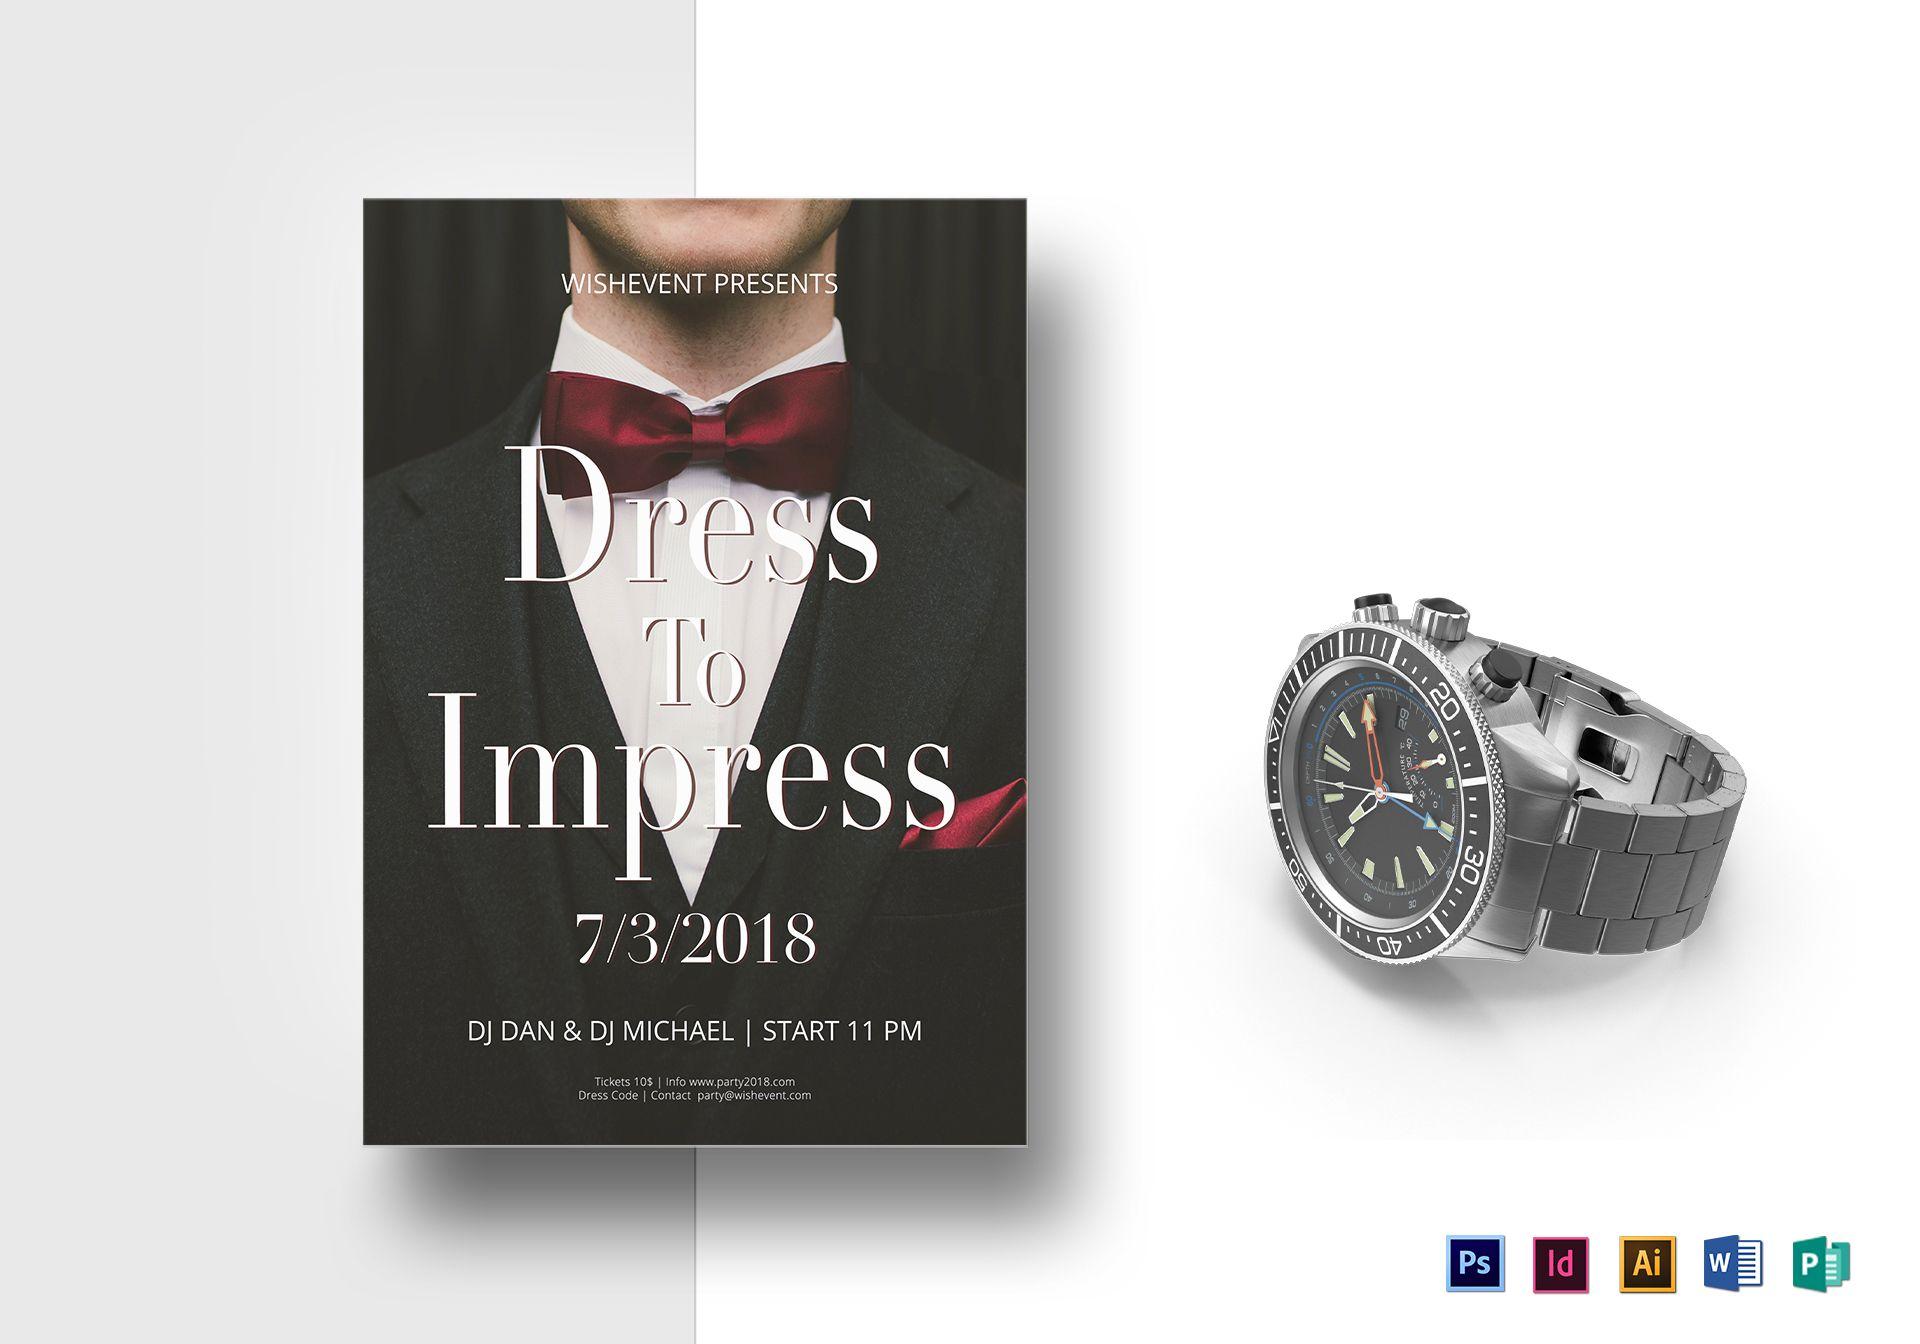 Dress To Impress Flyer Template